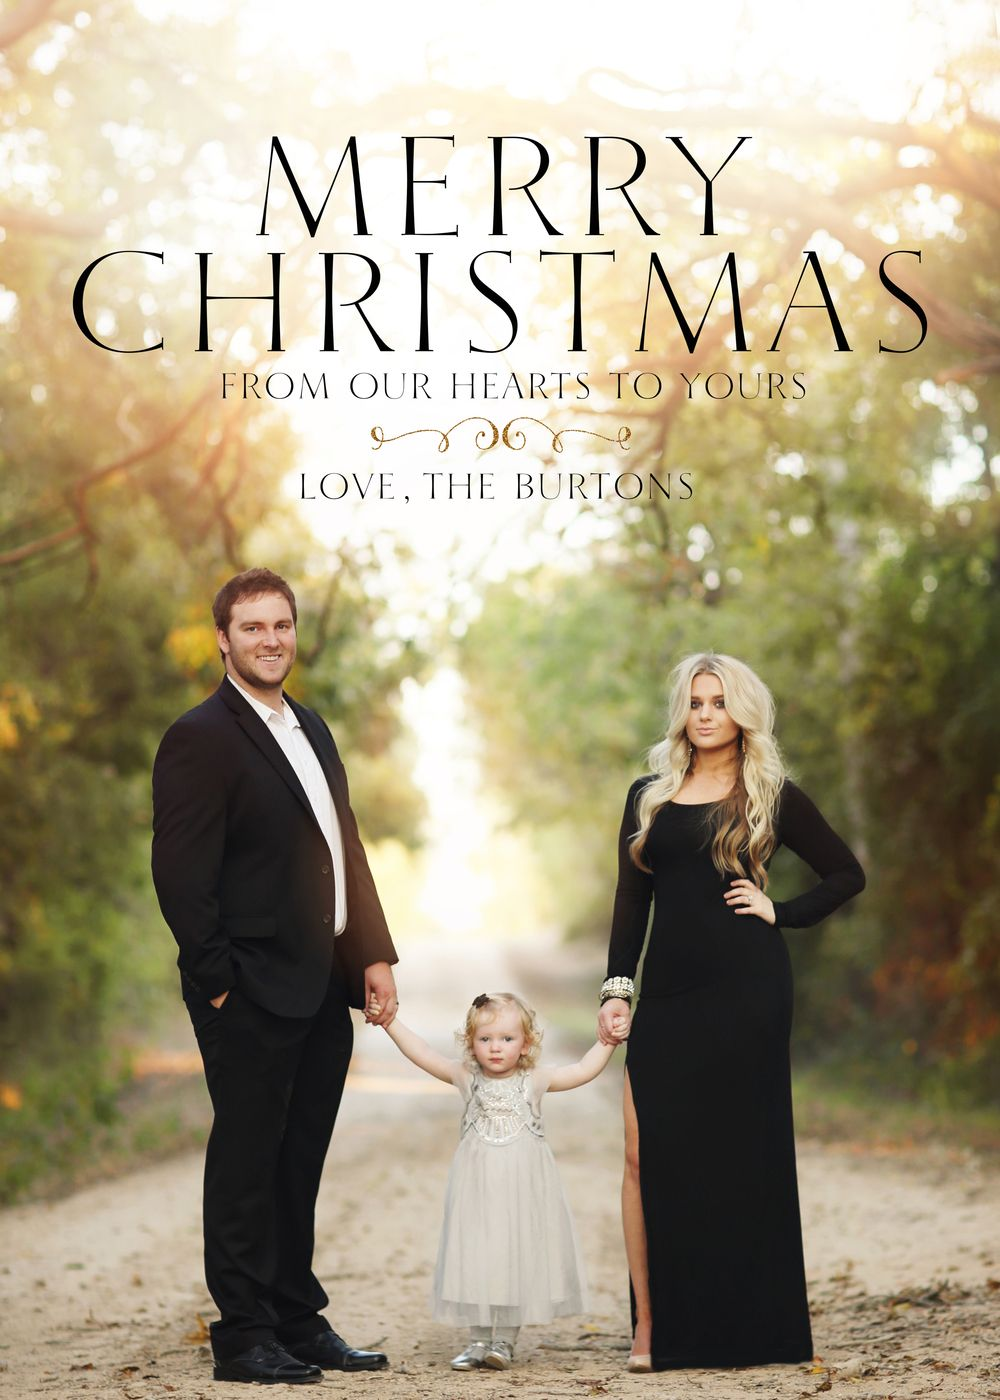 family photo christmas card ideas pinterest - glam family christmas card shoot holidaze